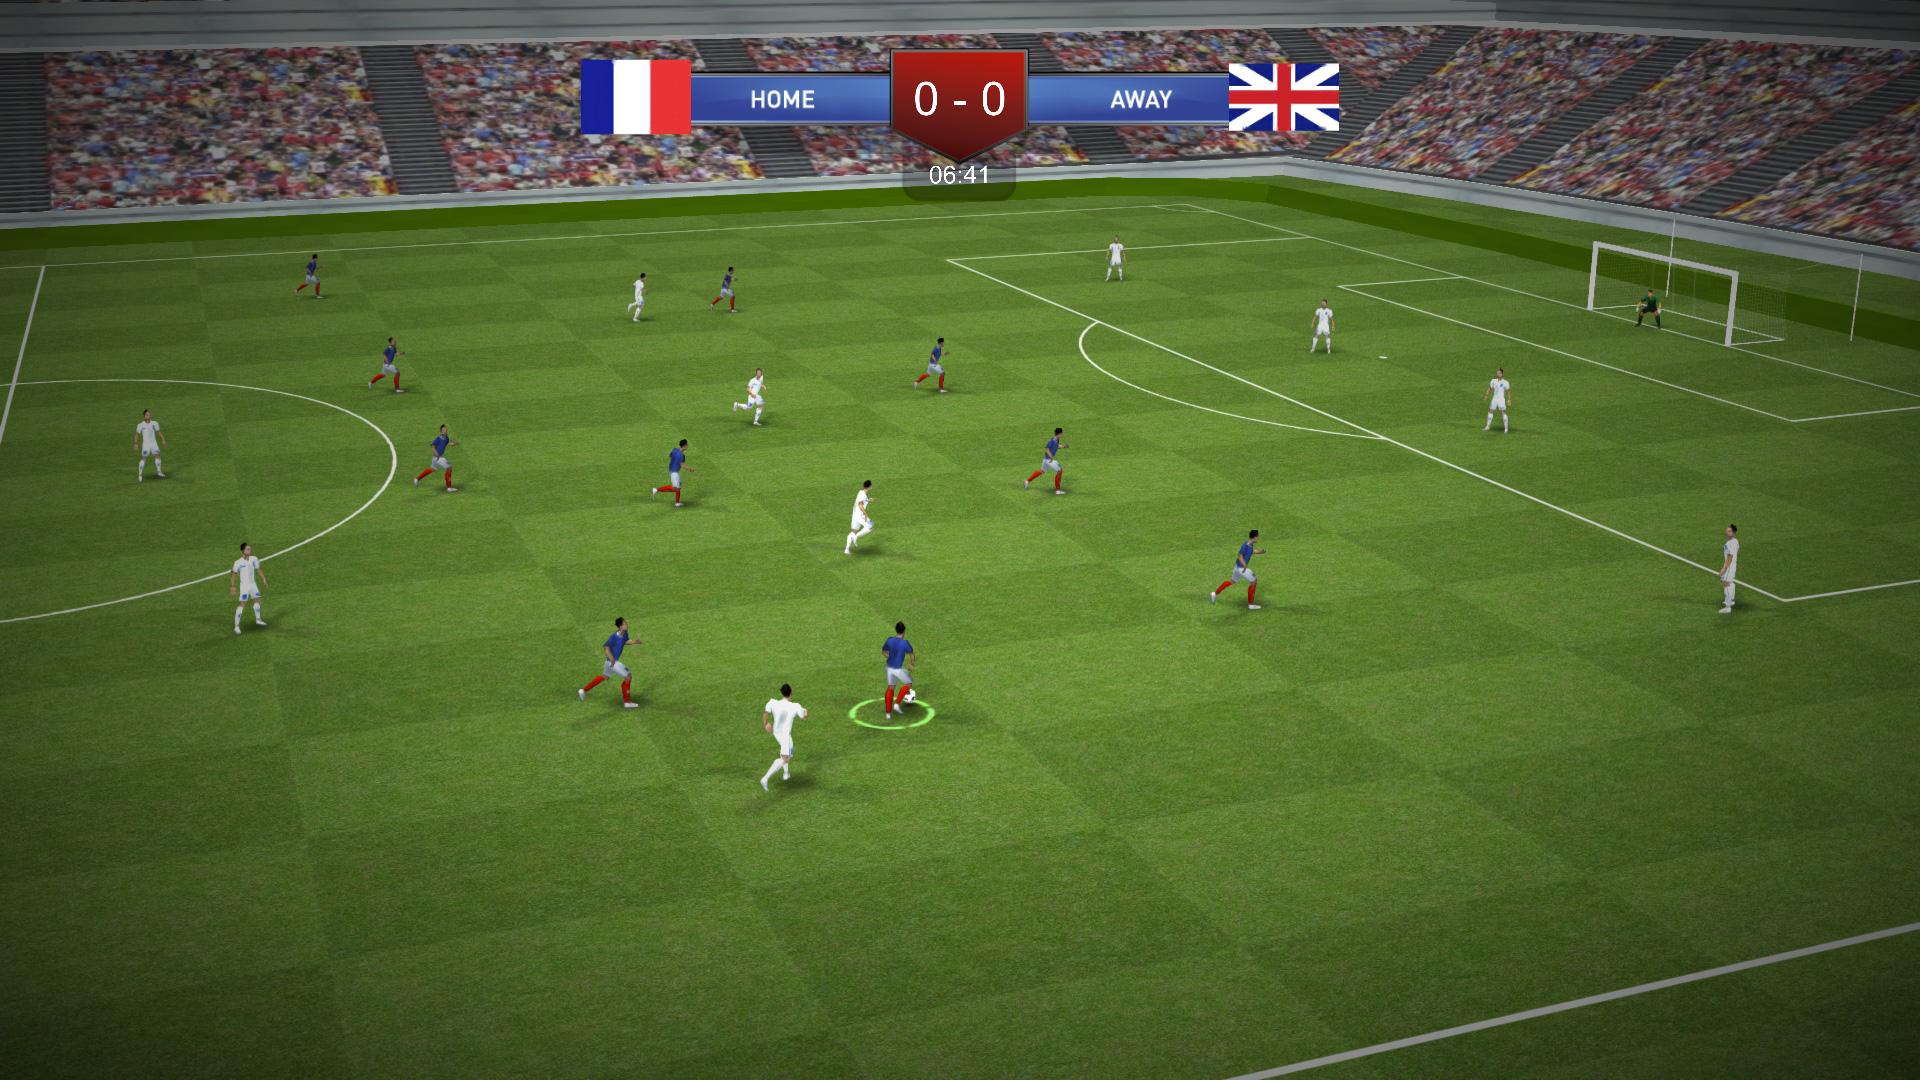 Soccer Pro 2016 — Football, Calico, Fußball, Fútbol screenshot 1